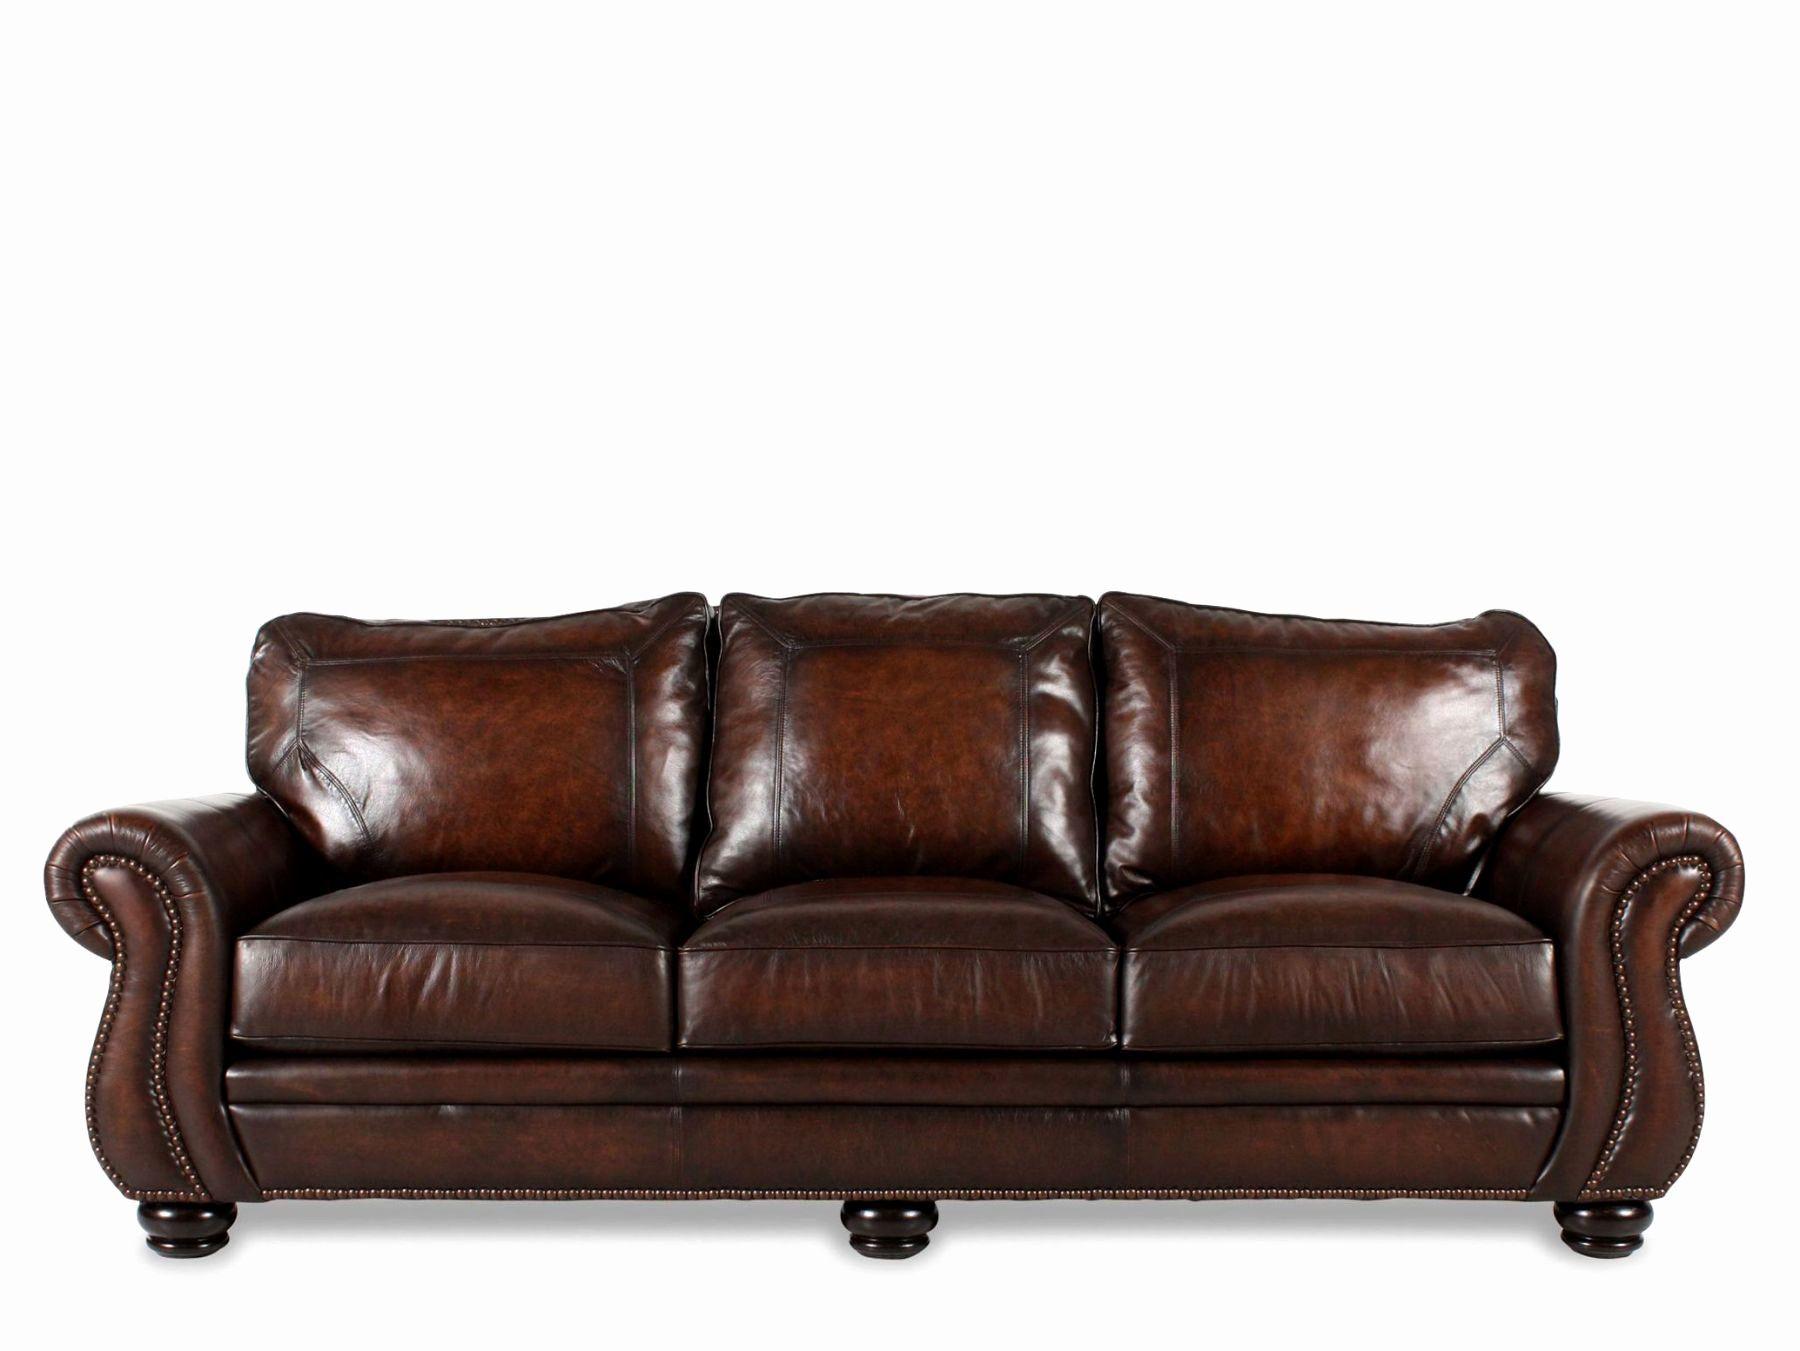 Swell New Lazy Boy Leather Sofa Photos Lazy Boy Leather Sofa Ibusinesslaw Wood Chair Design Ideas Ibusinesslaworg